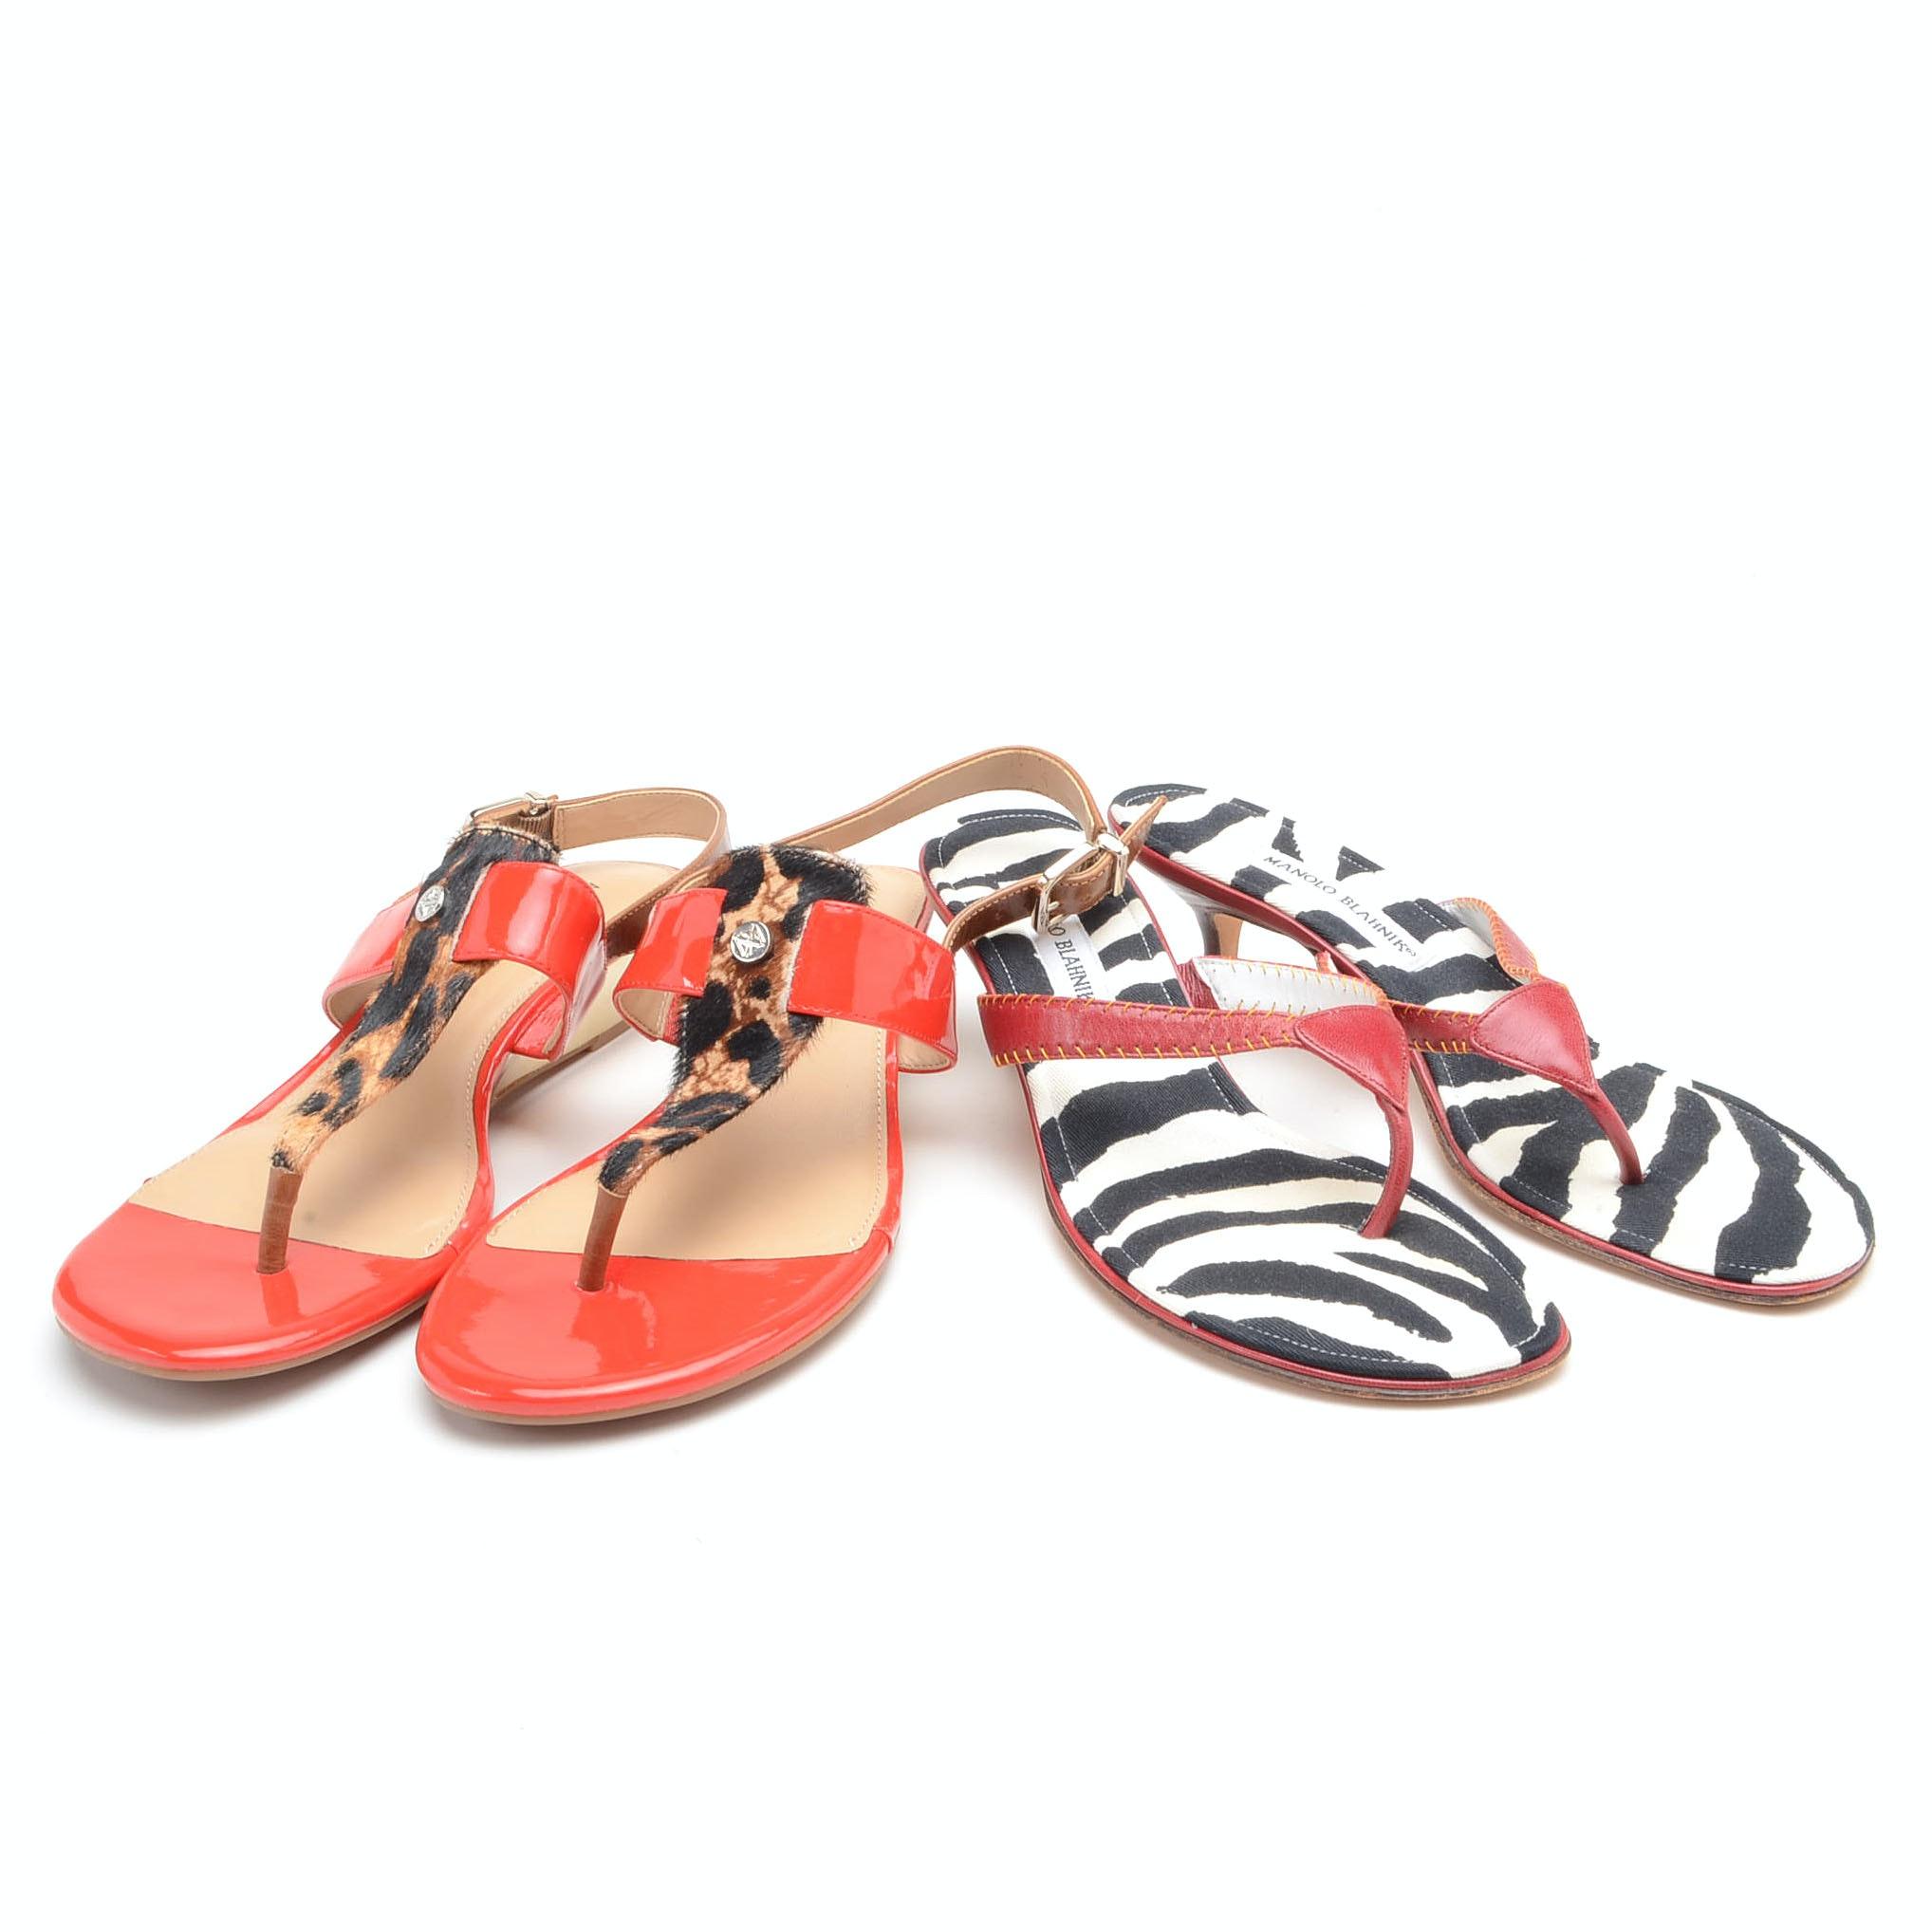 Two Pairs of Designer Sandal Heels